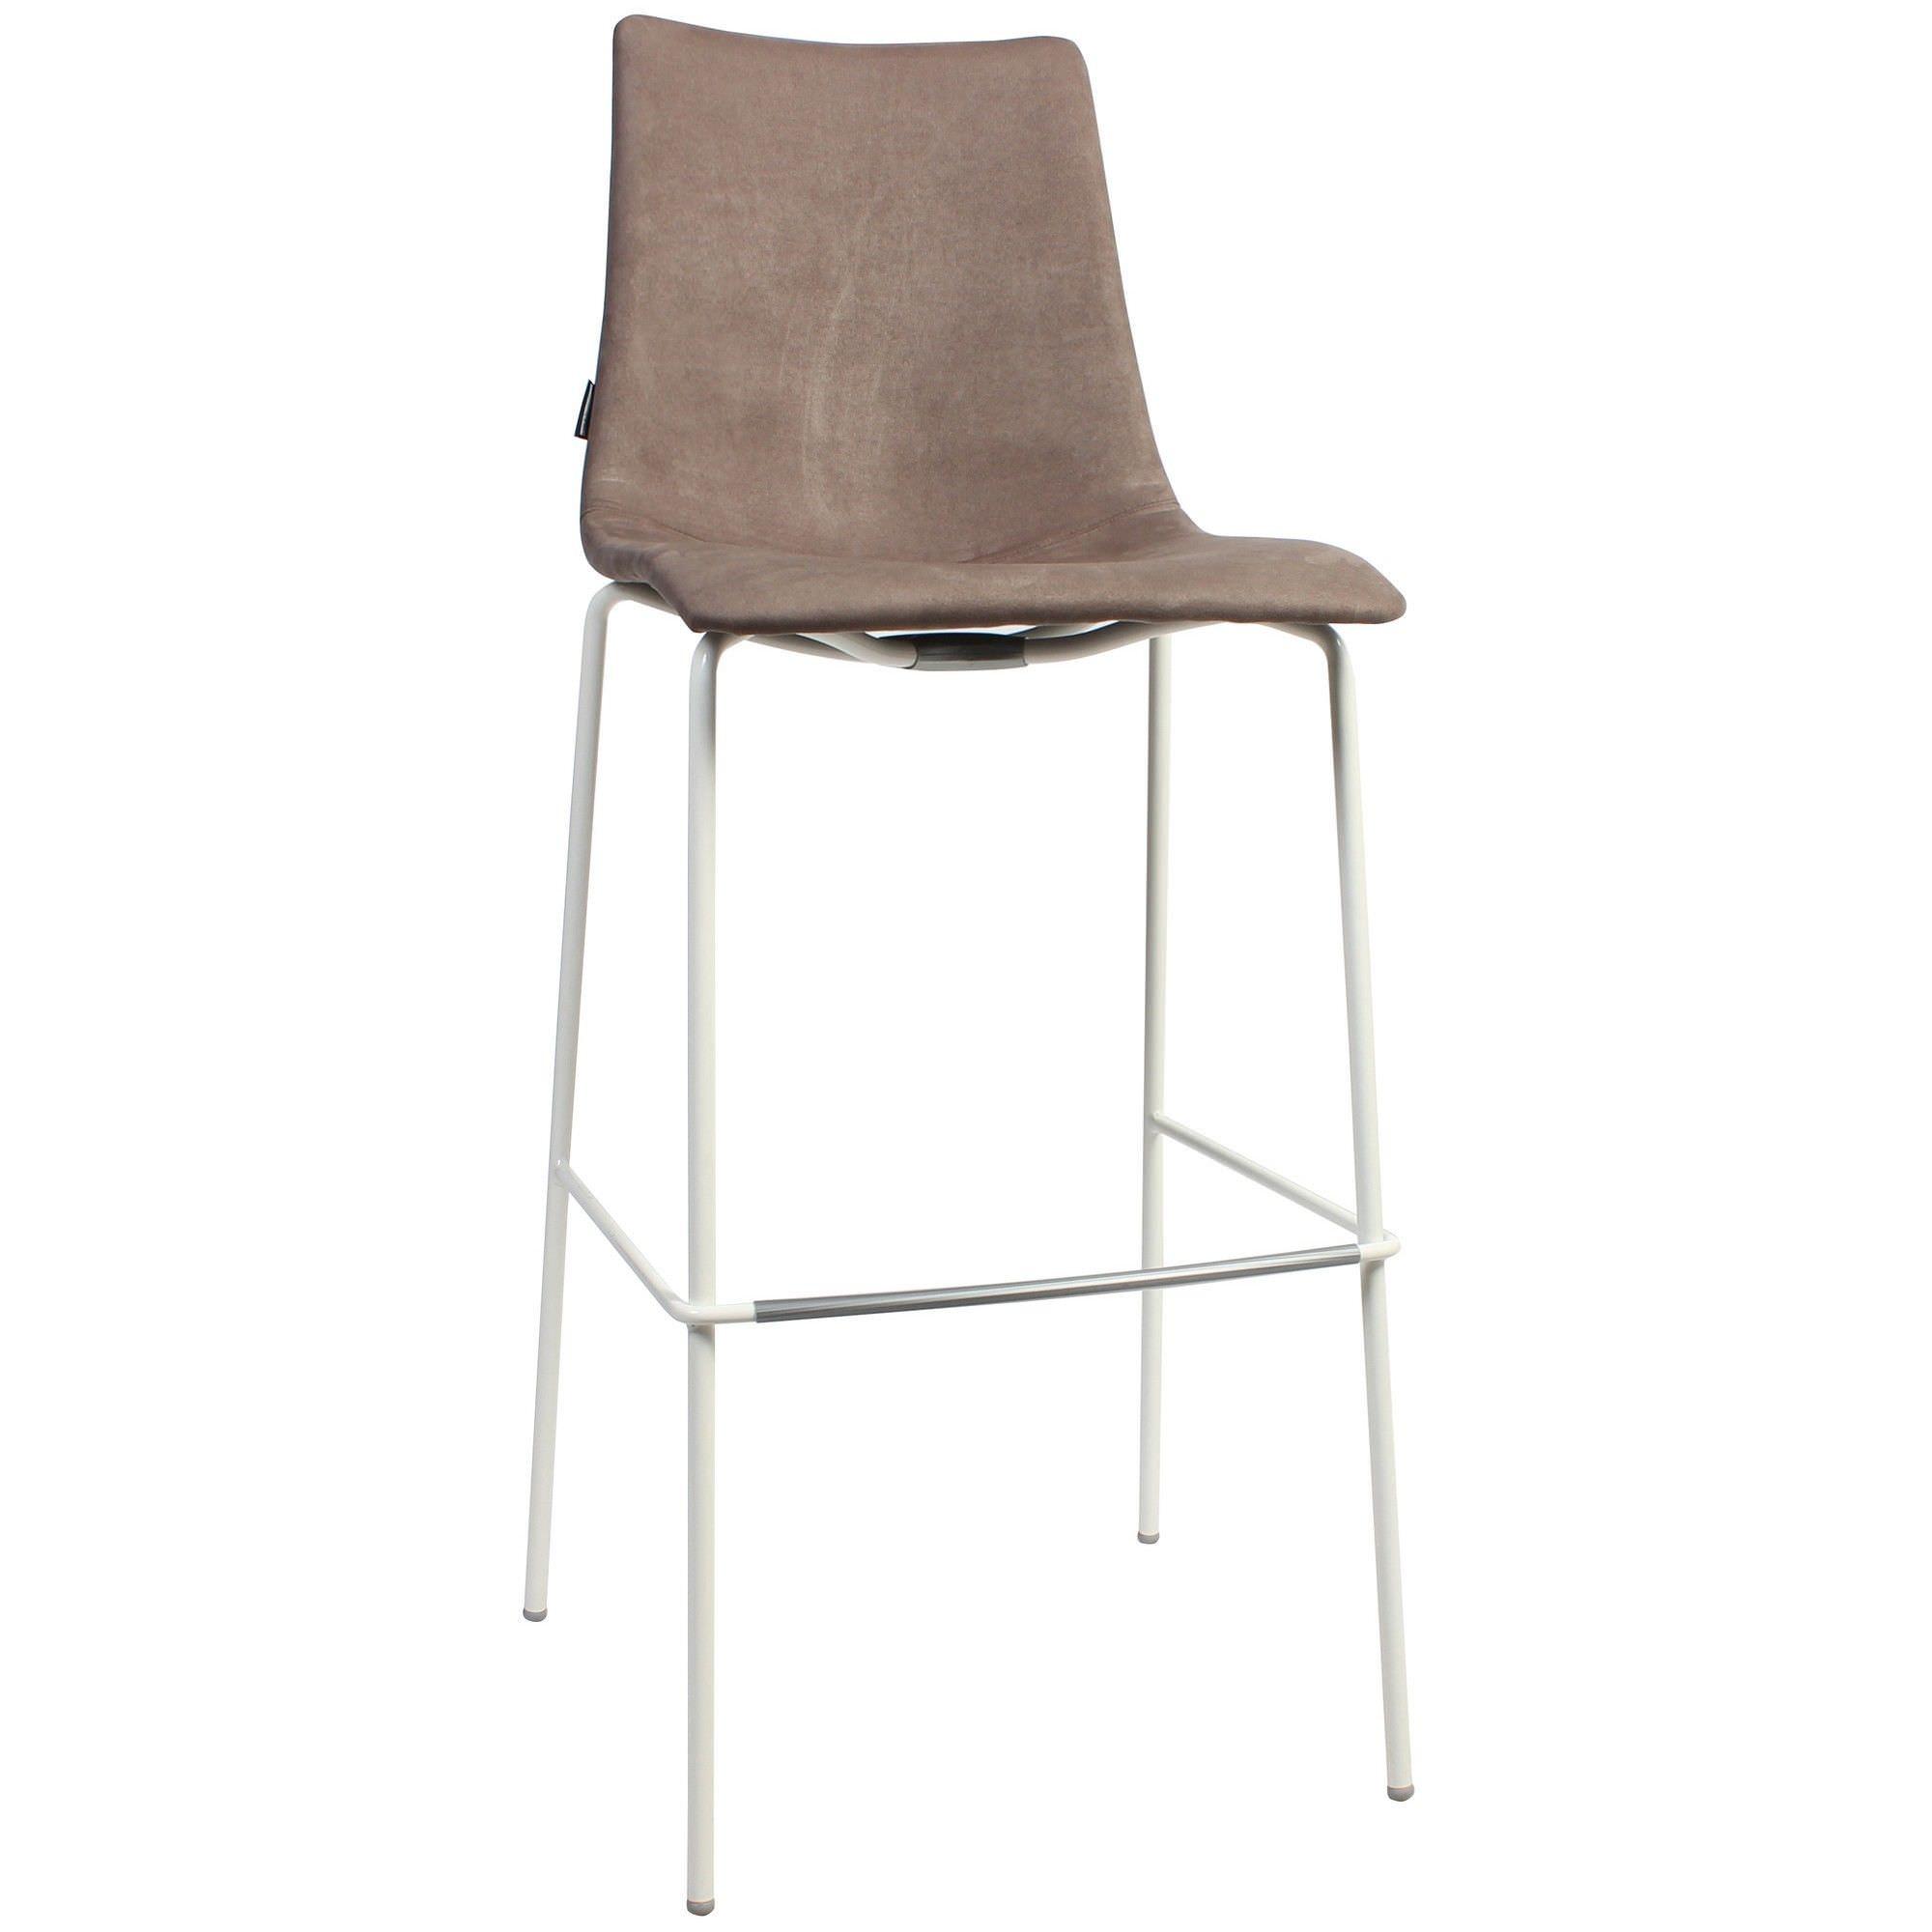 Zebra Pop Italian Made Commercial Grade Fabric Bar Stool, Metal Leg, Brown / White